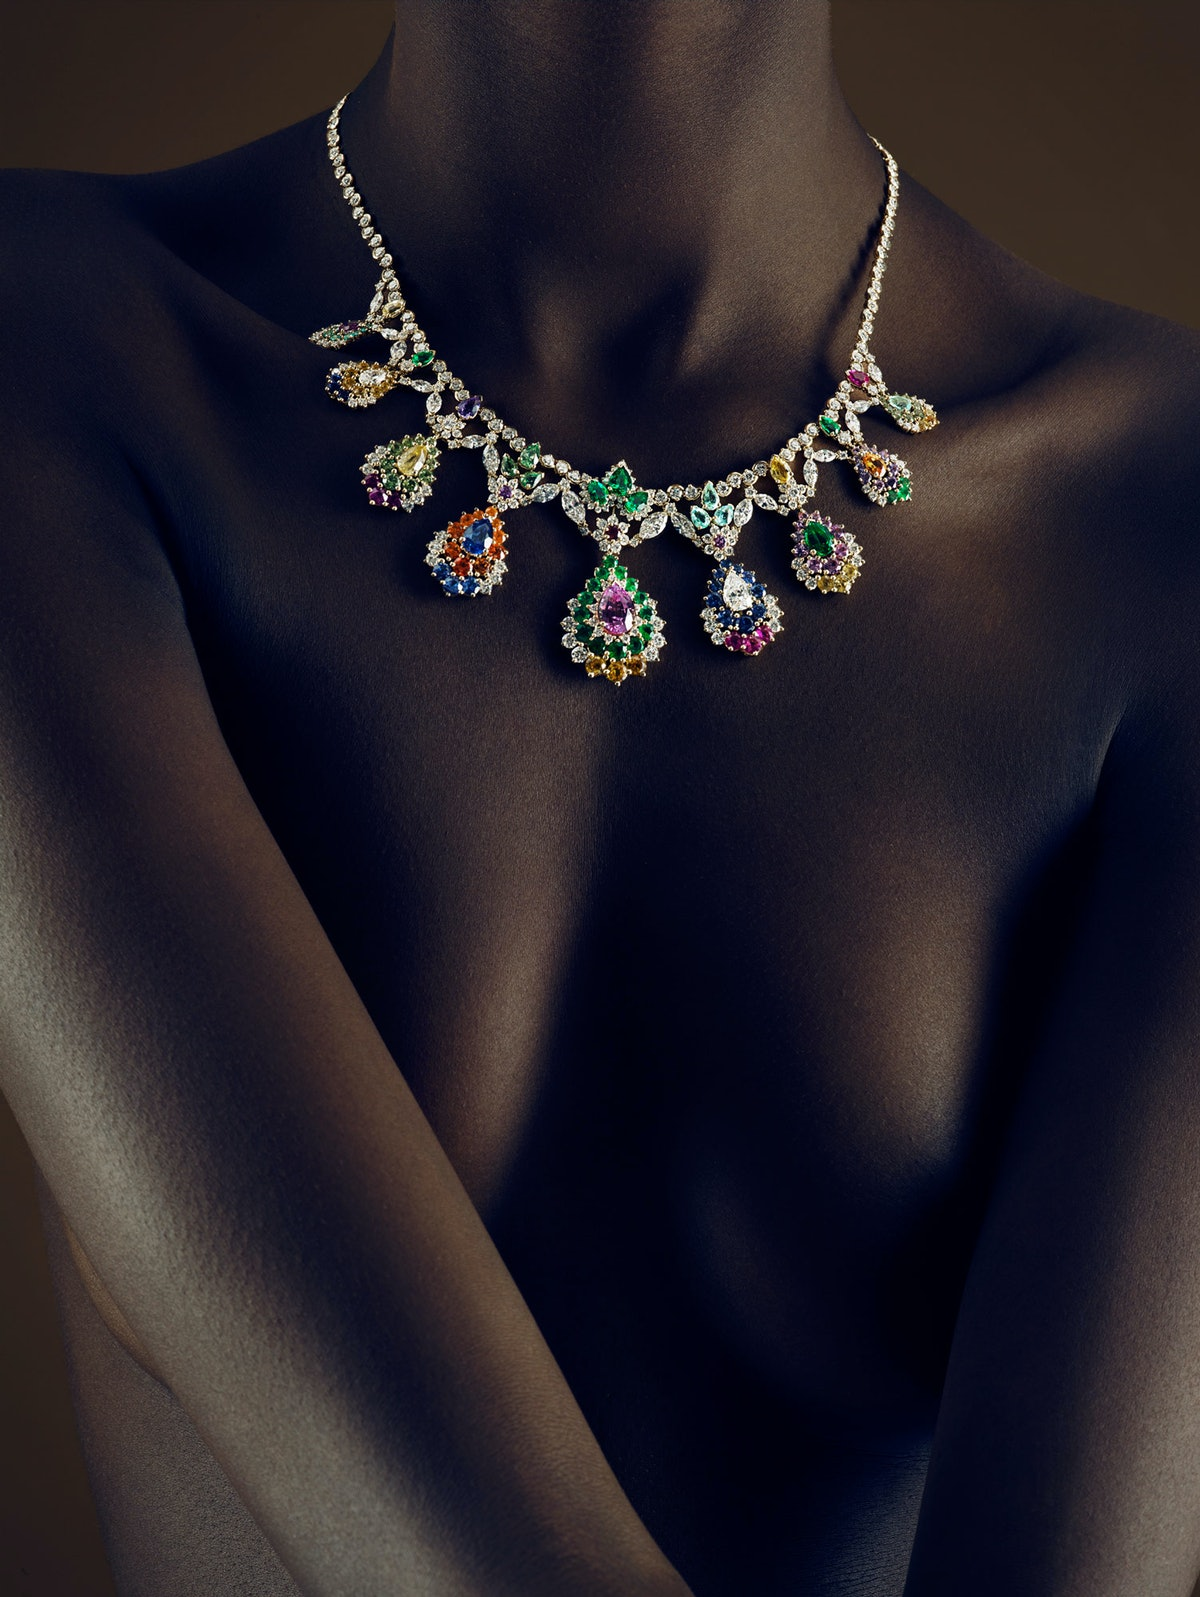 Dior Fine Jewelry gold, ruby, sapphire, garnet, tourmaline, emerald, and diamond necklace.